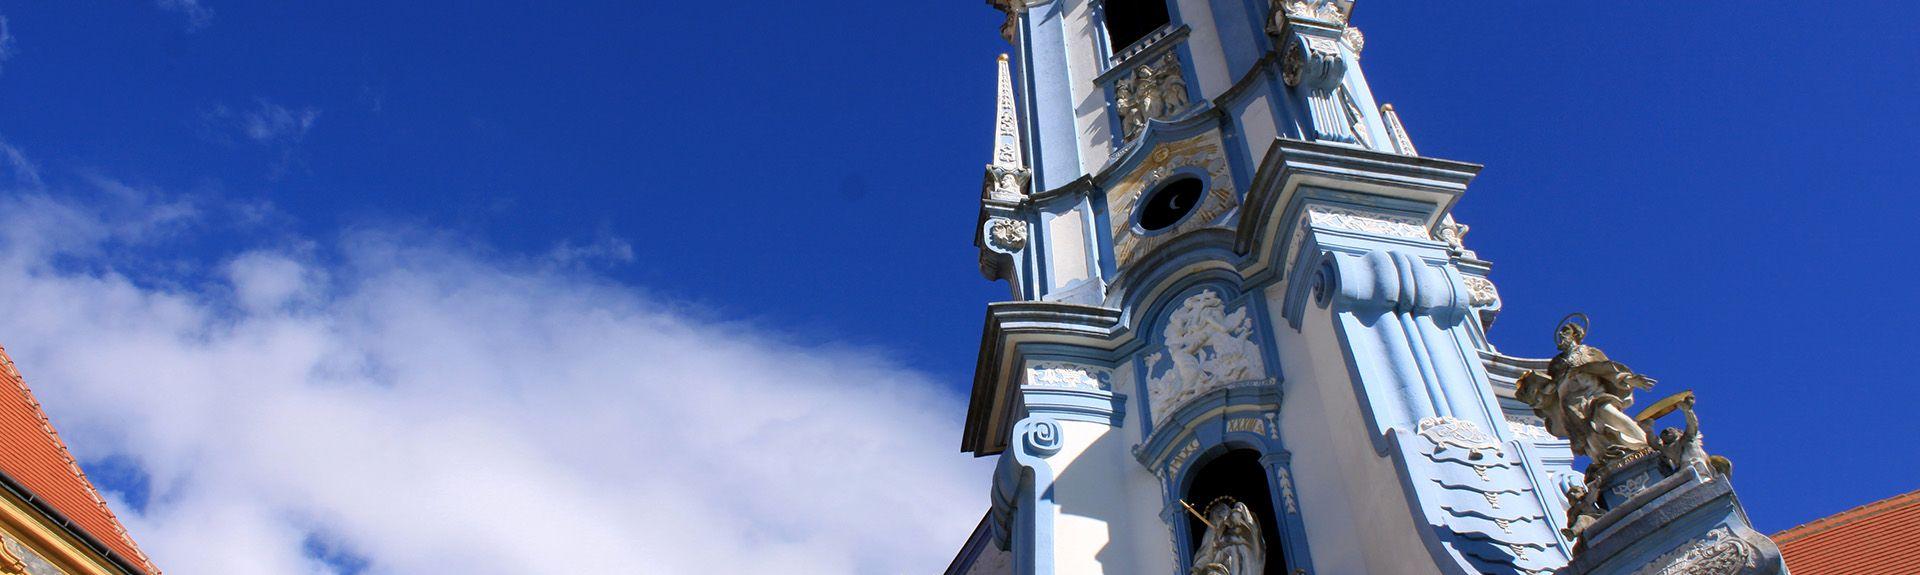 Distretto di Melk, Bassa Austria, Austria